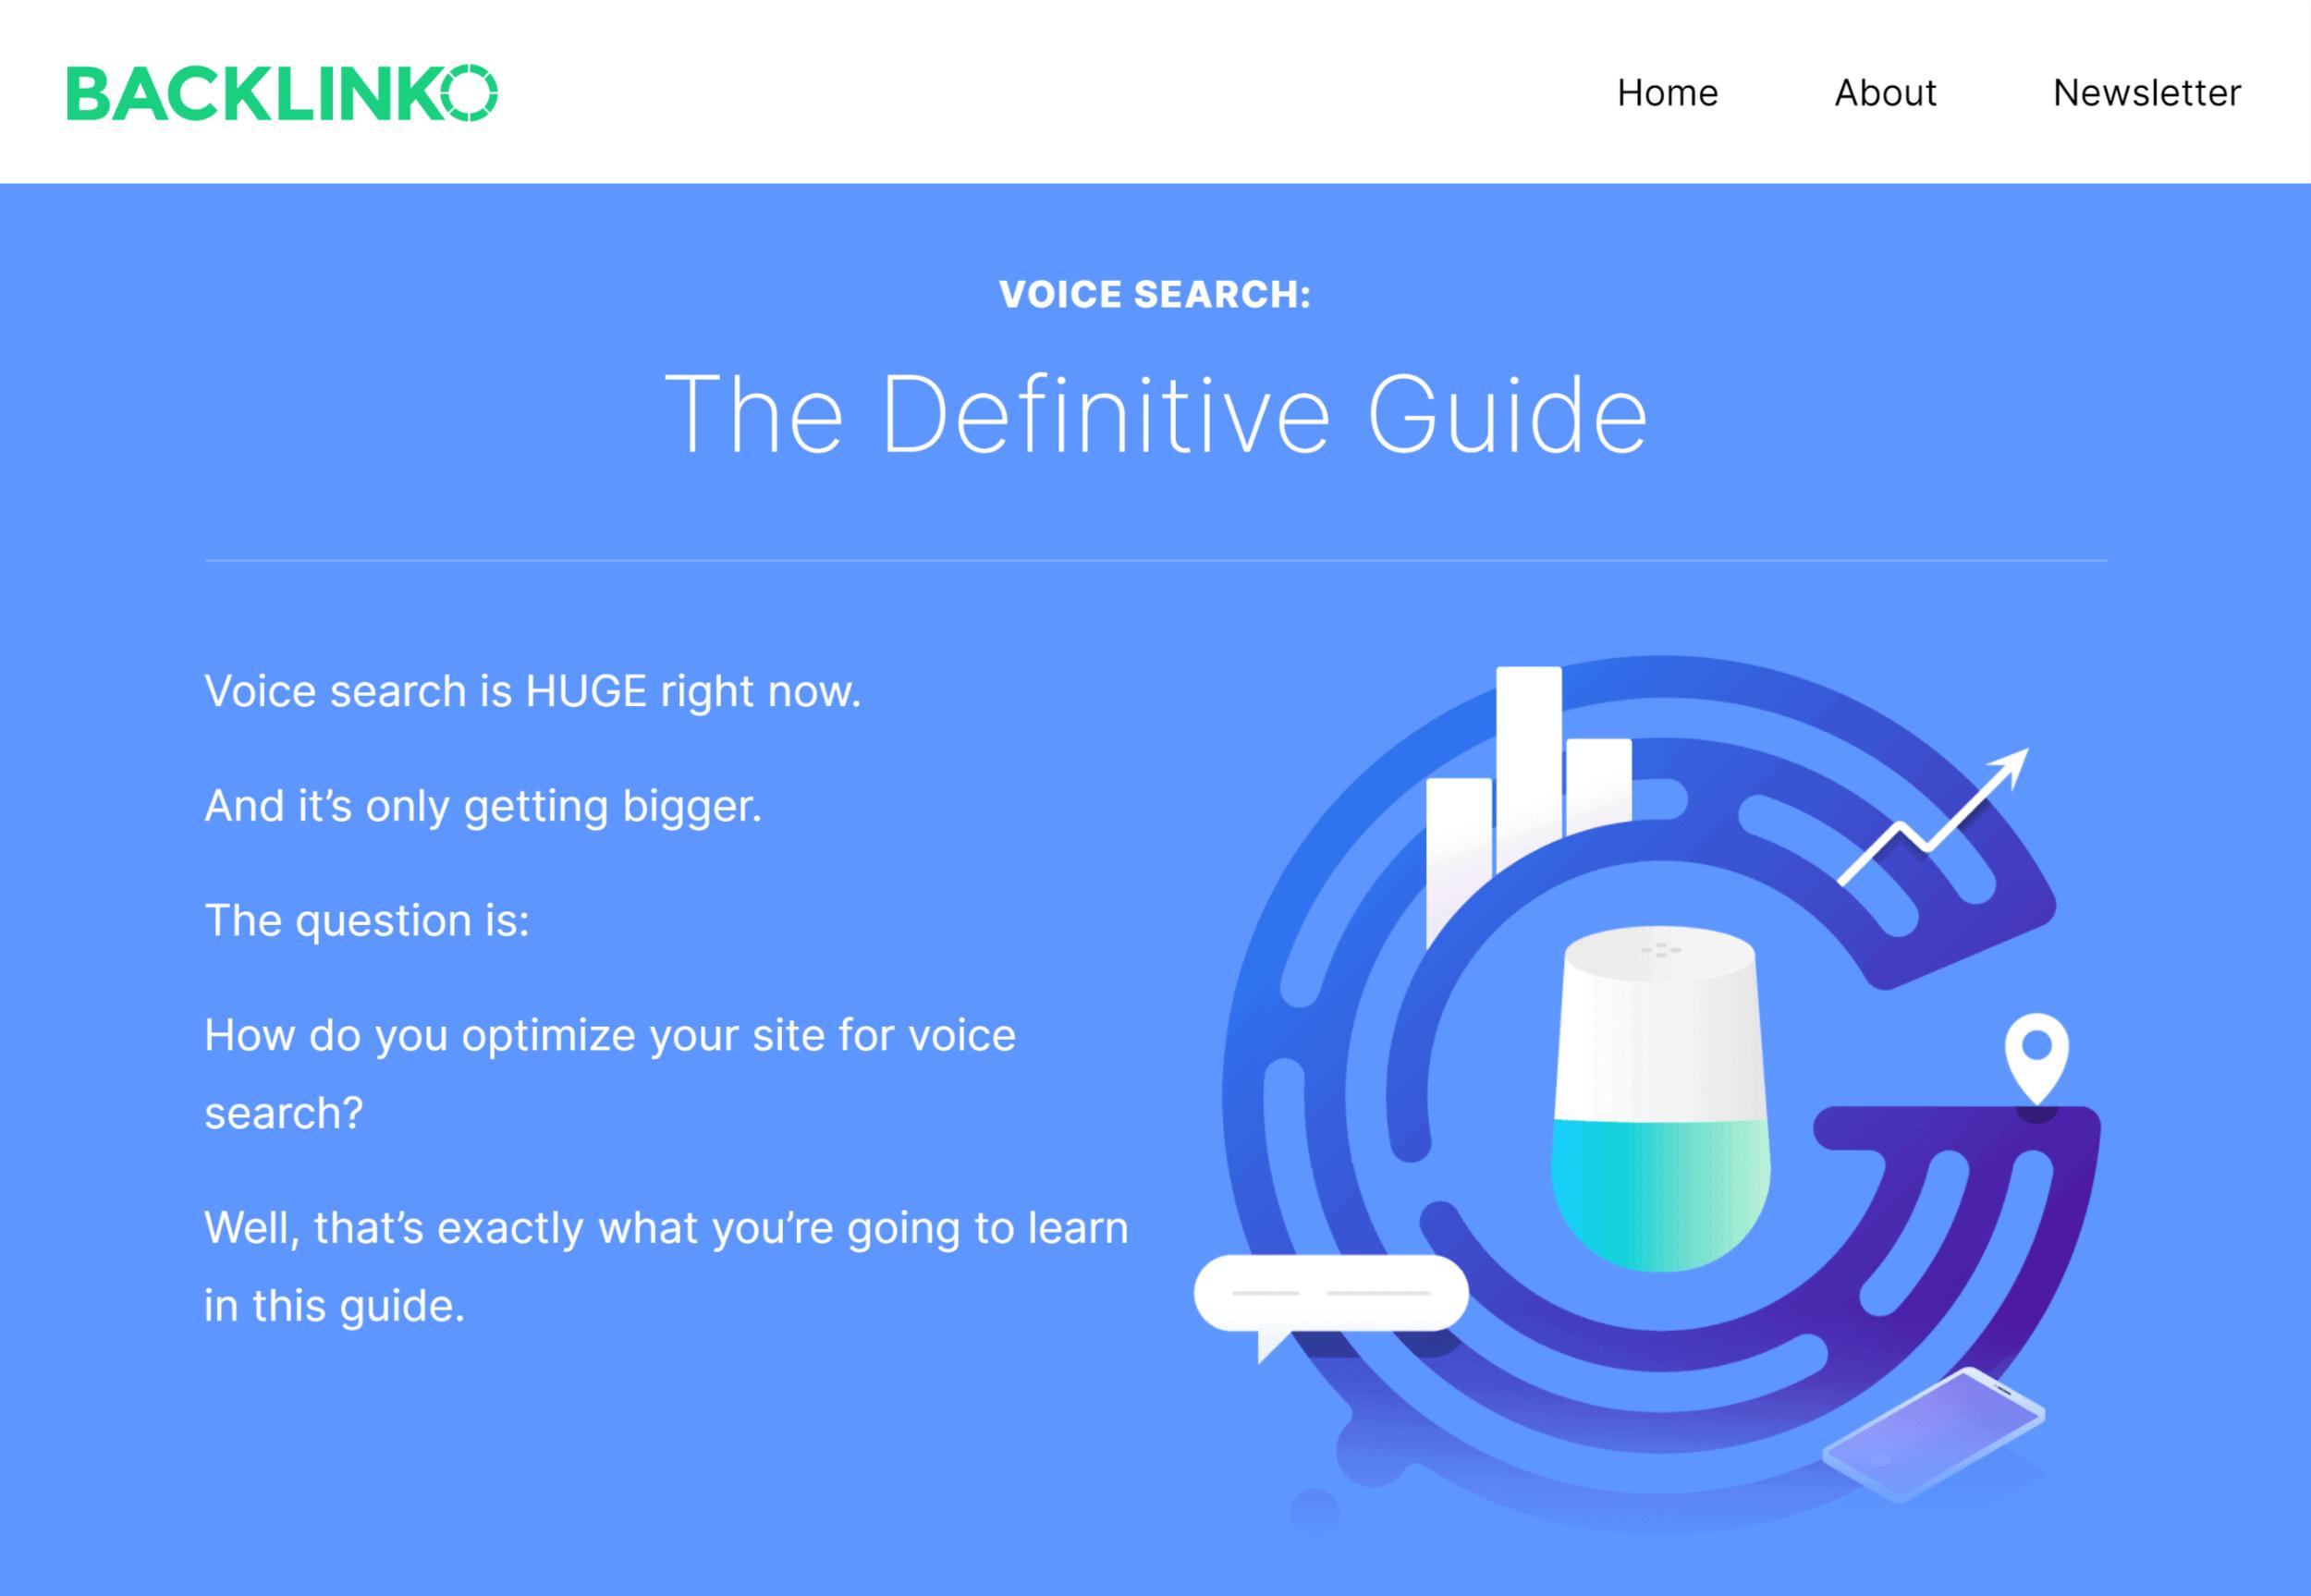 Backlinko – Optimize for voice search guide